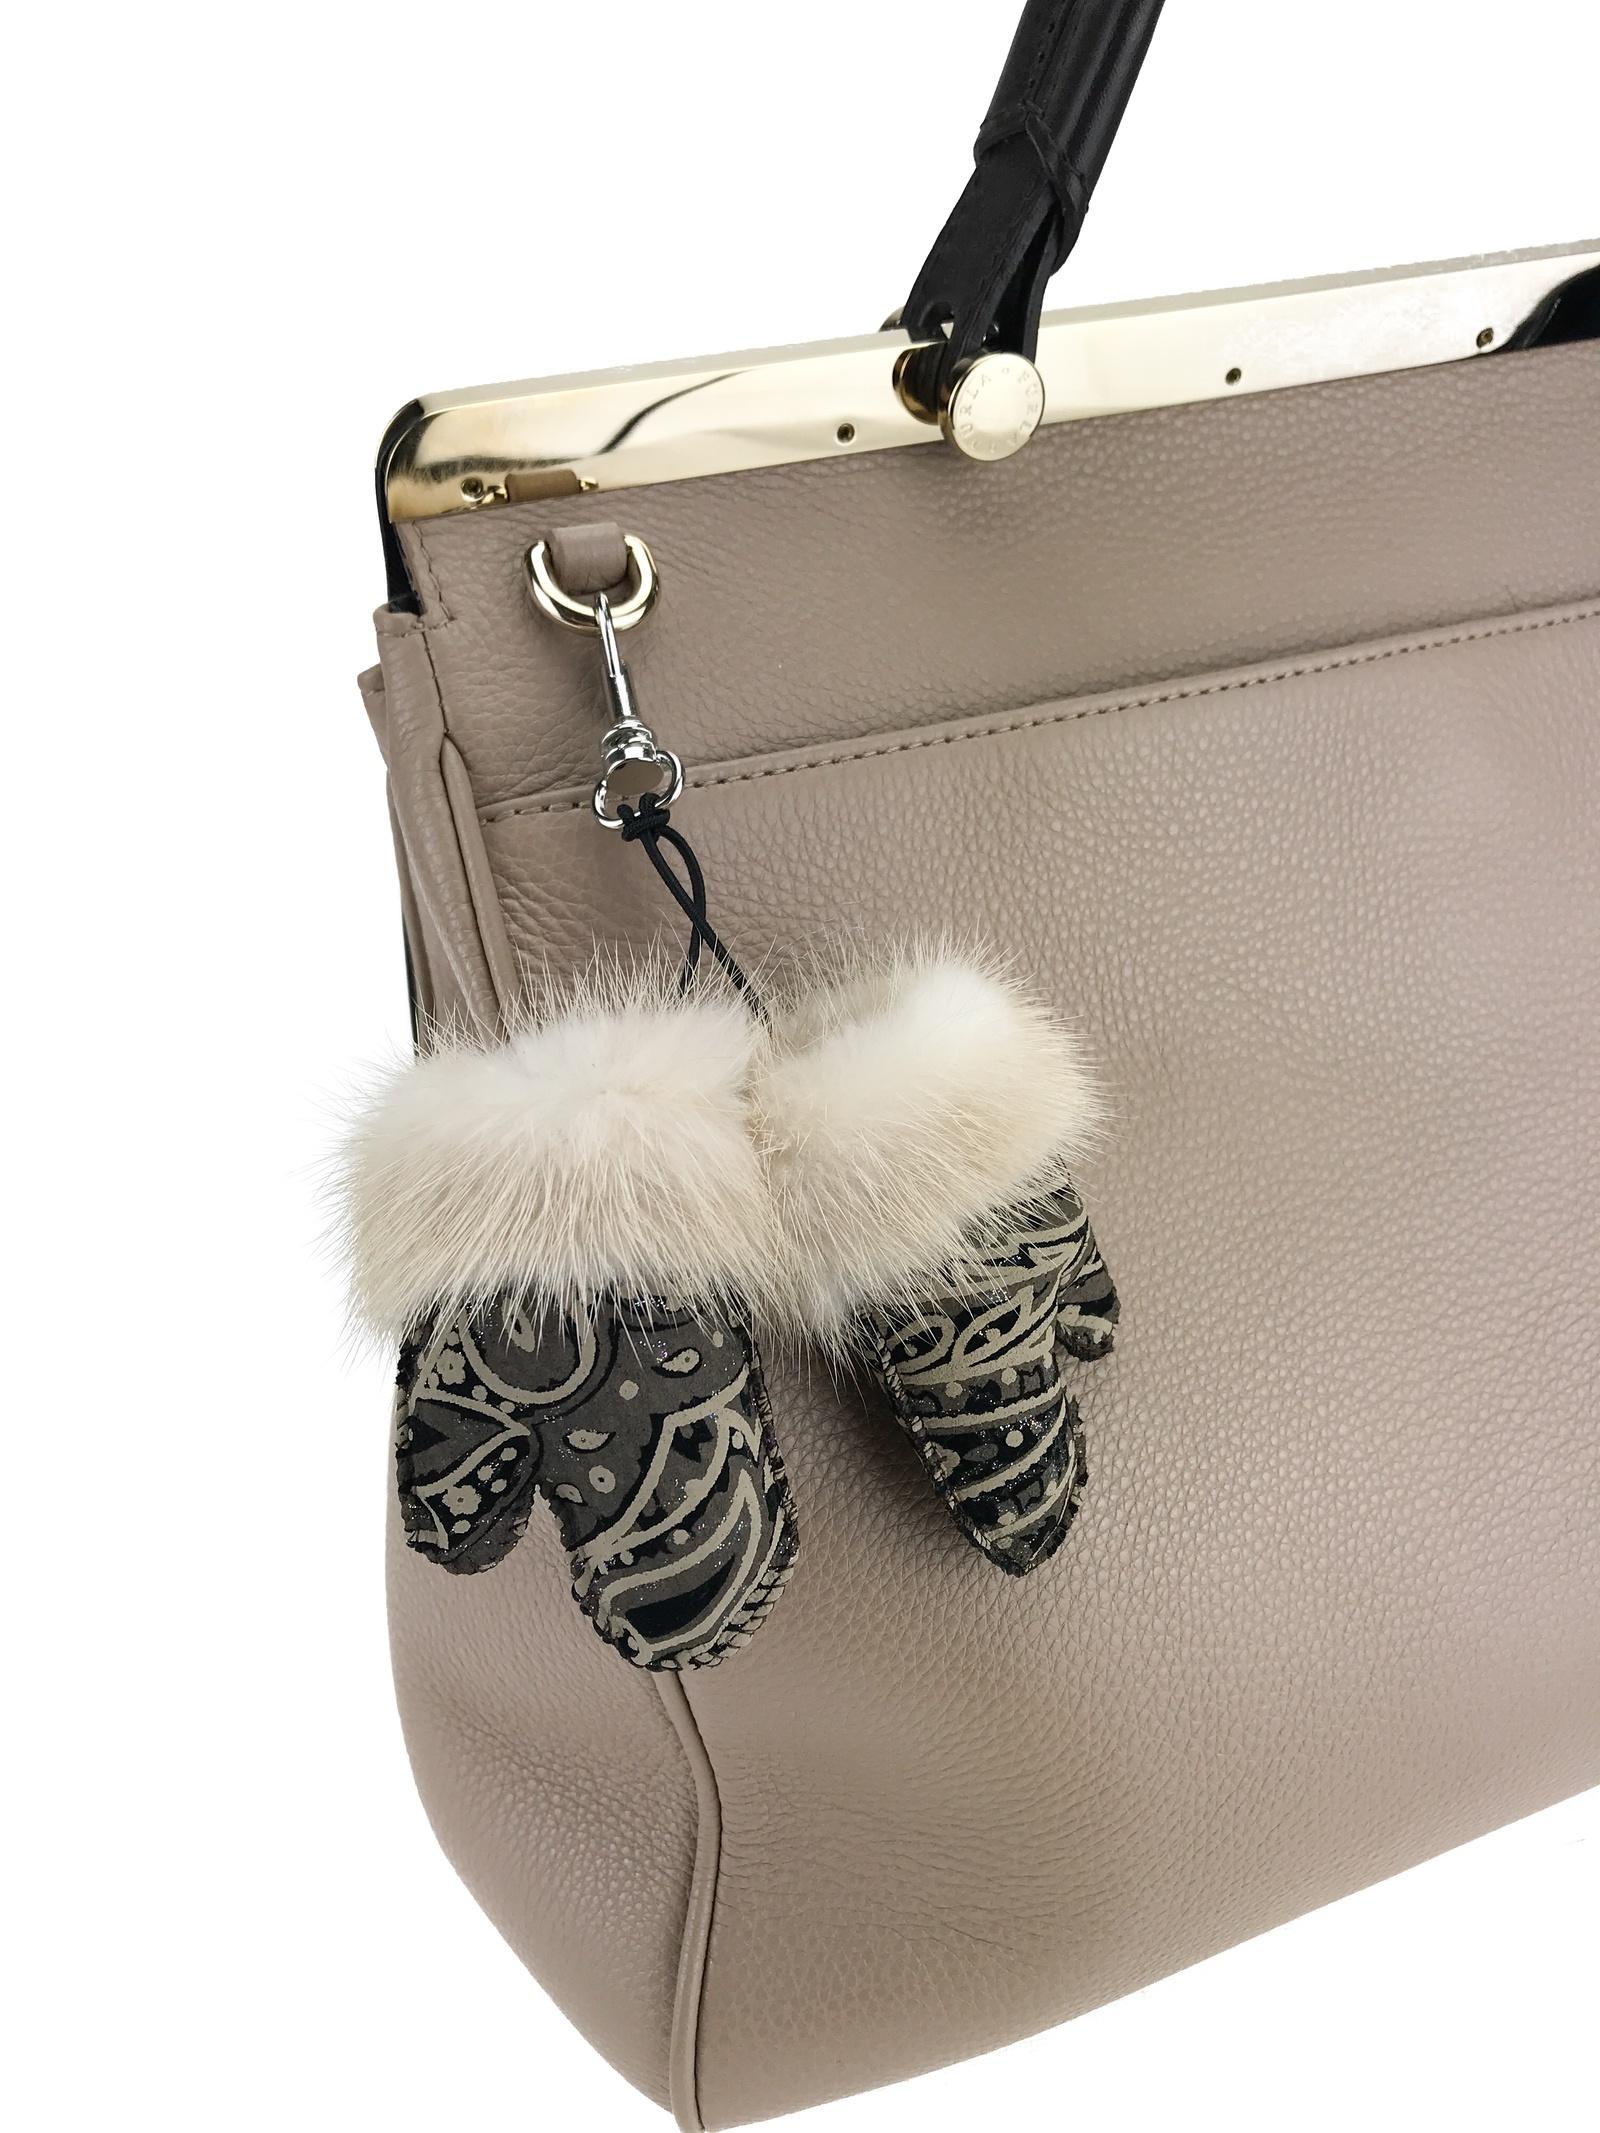 Брелок для сумки Mex-Style Брелок-рукавички, ф.778 Брелок-рукавички (кожа черная/норка паломино, 0) брелок для сумки rolf schulte